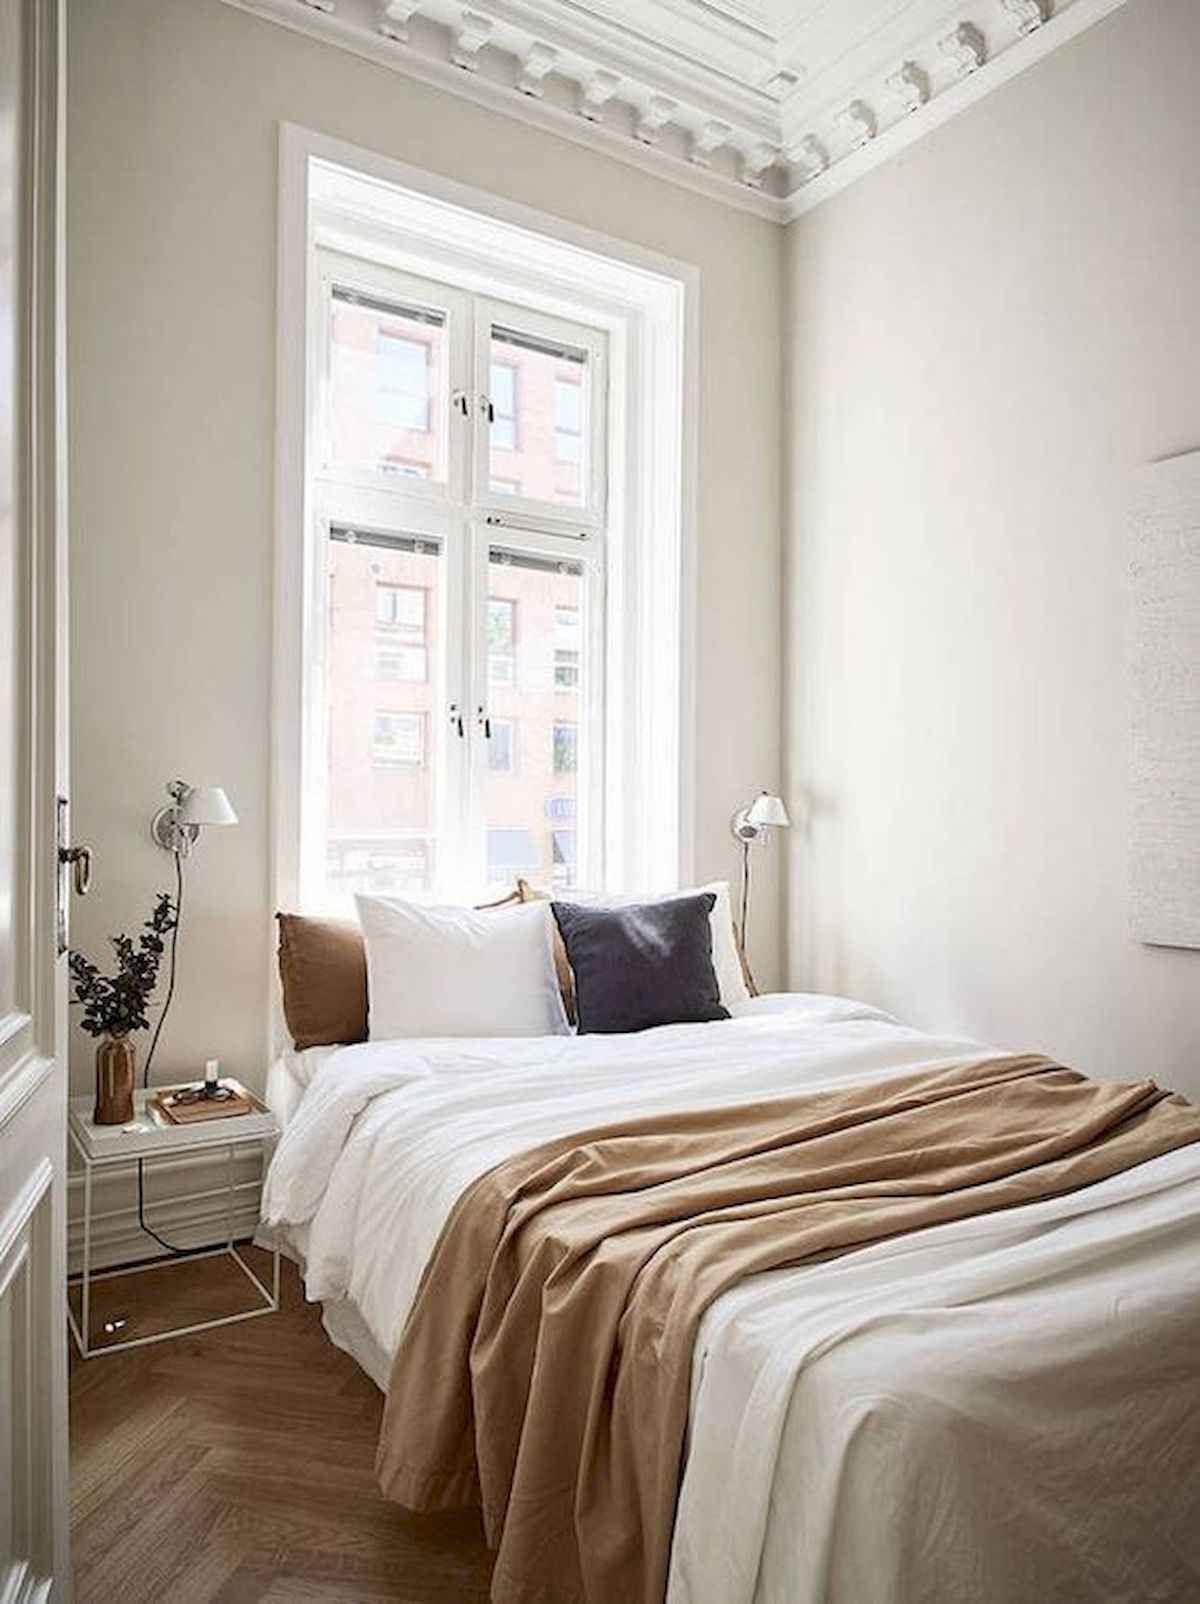 50 stunning small apartment bedroom design ideas and decor on stunning minimalist apartment décor ideas home decor for your small apartment id=94524